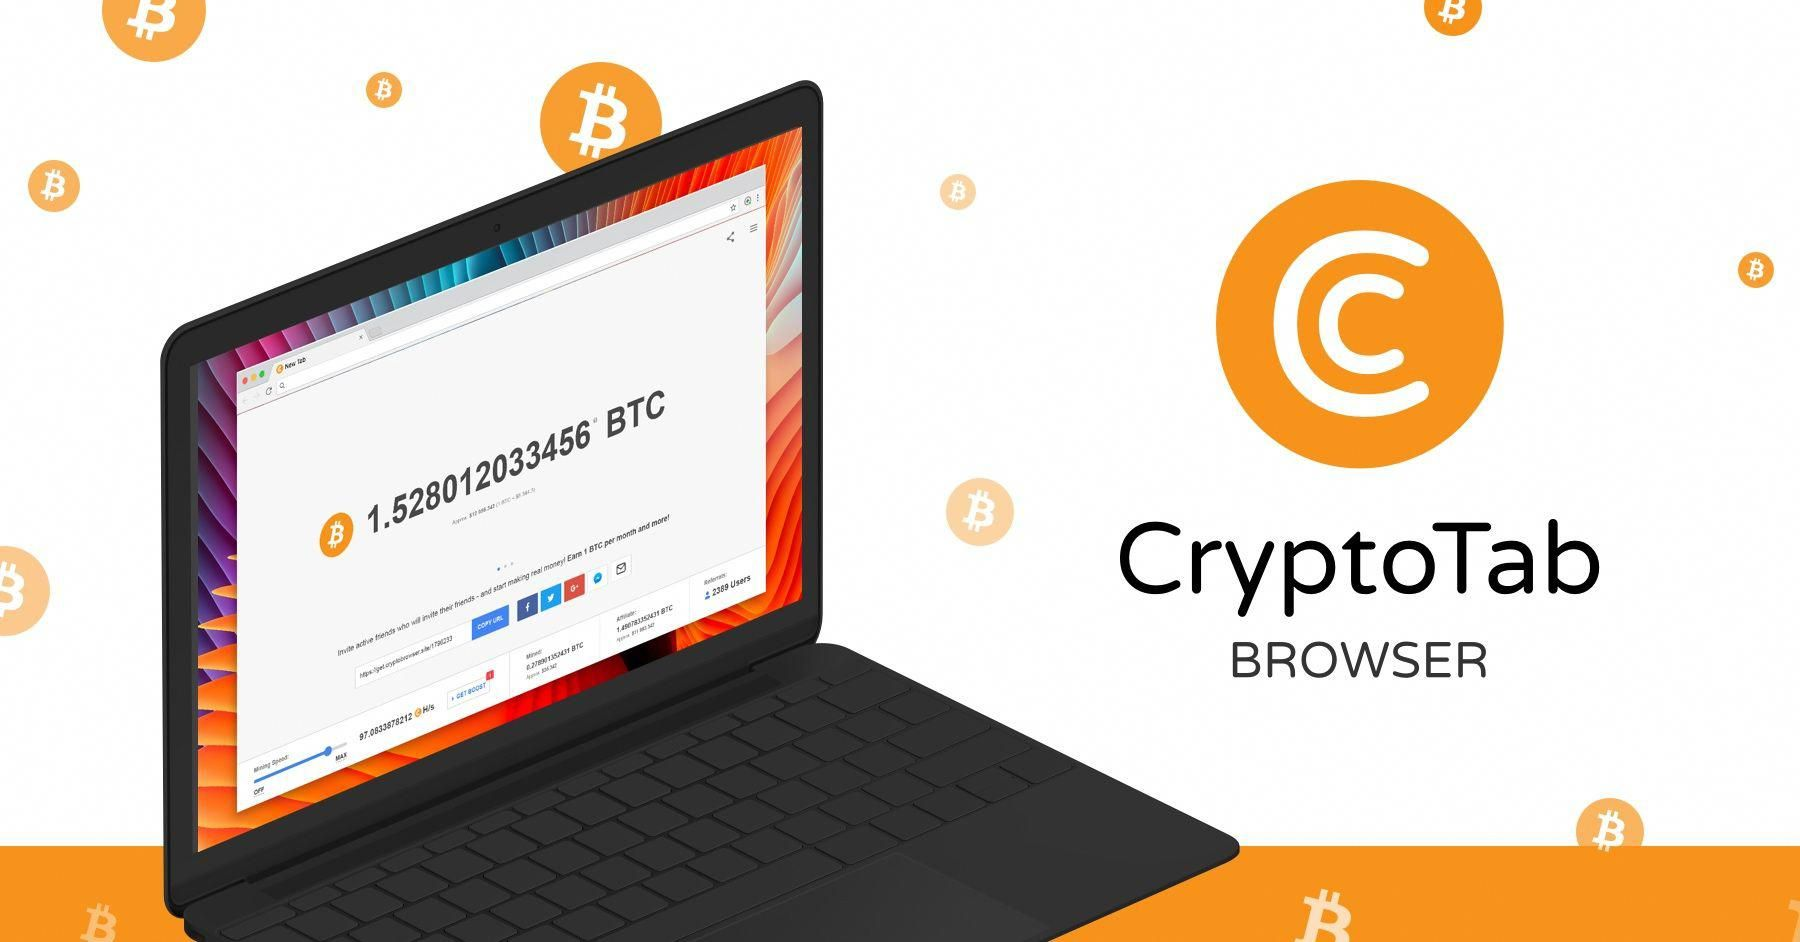 go get free bitcoins today bitcoinsforfreeyes Bitcoin